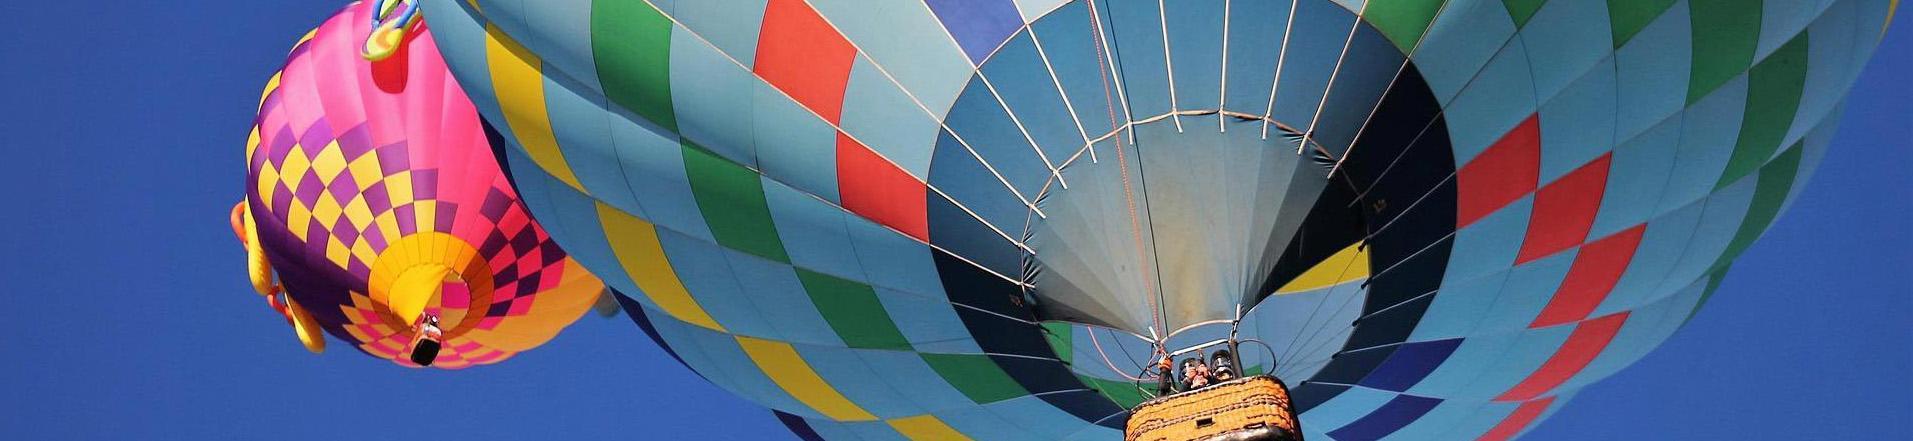 Slide mongolfiere per Bicocca International Day